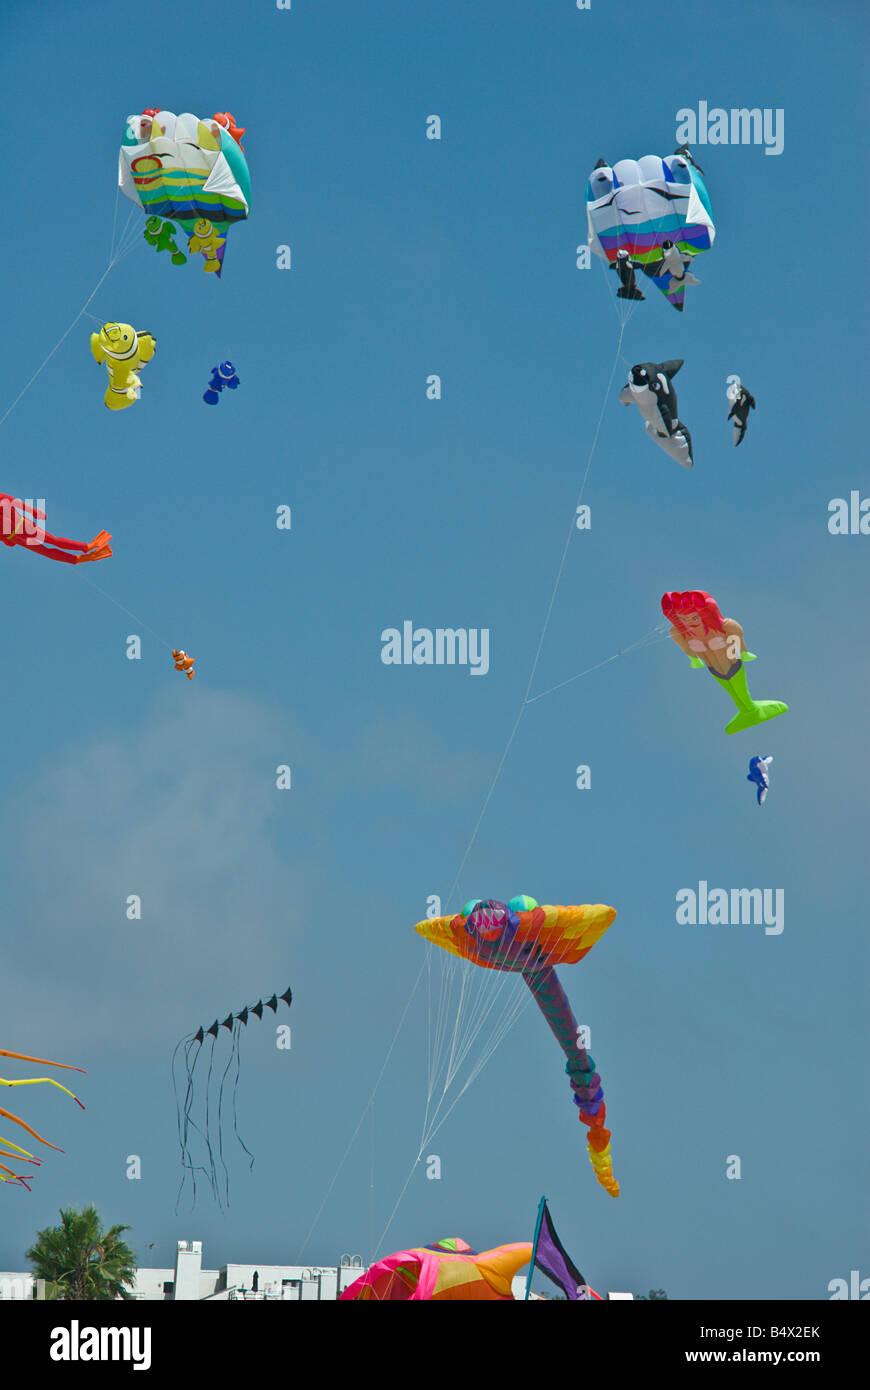 Santa Monica  Ca, north, America, United, States, flying kites Spiderman, fish, travel, tourism, tourists, - Stock Image